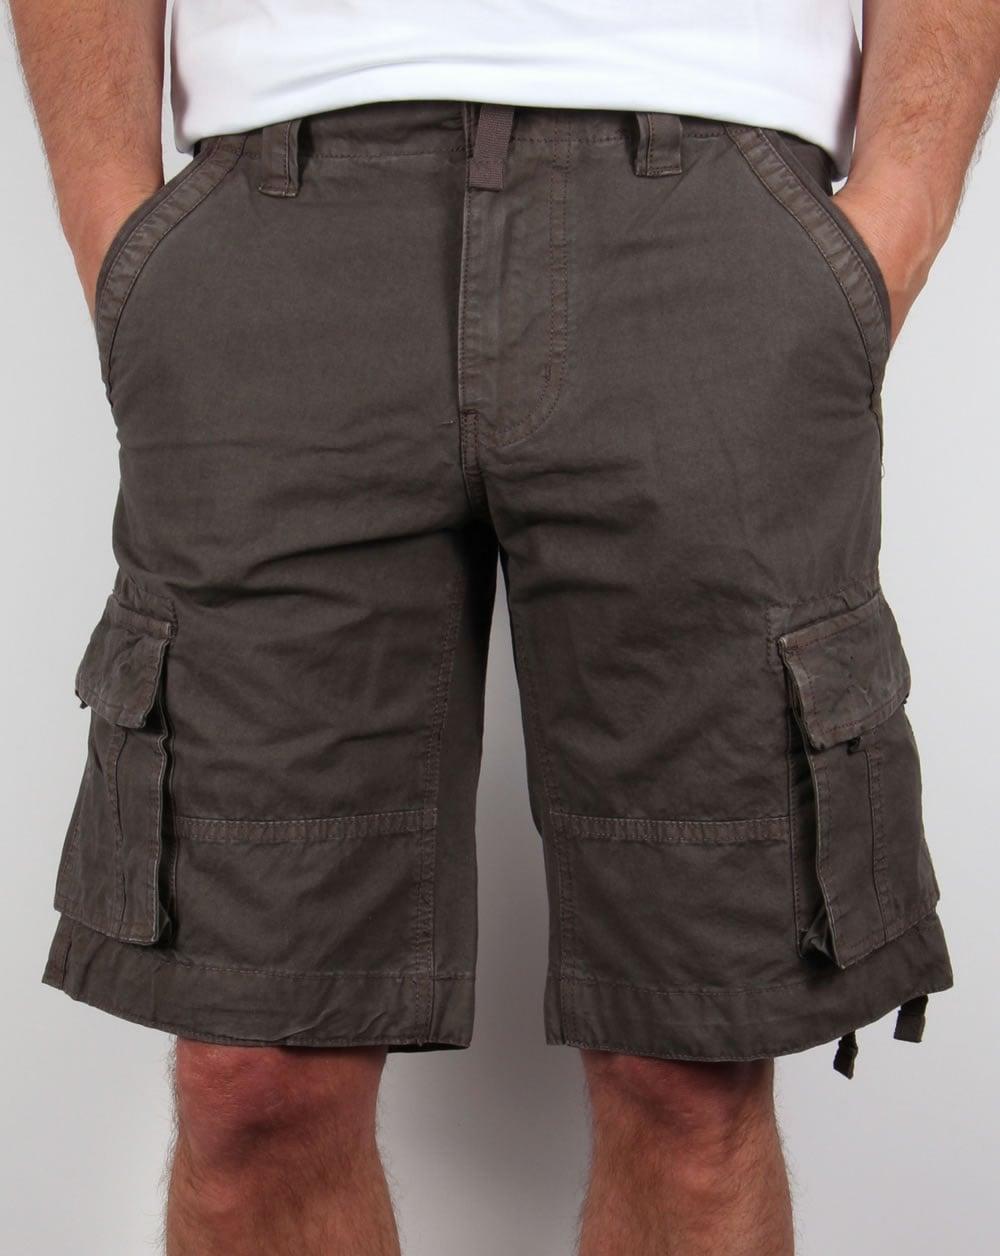 4a09f113f3 Bellfield Combat Shorts Khaki,cargo,multi pocket,army,mens